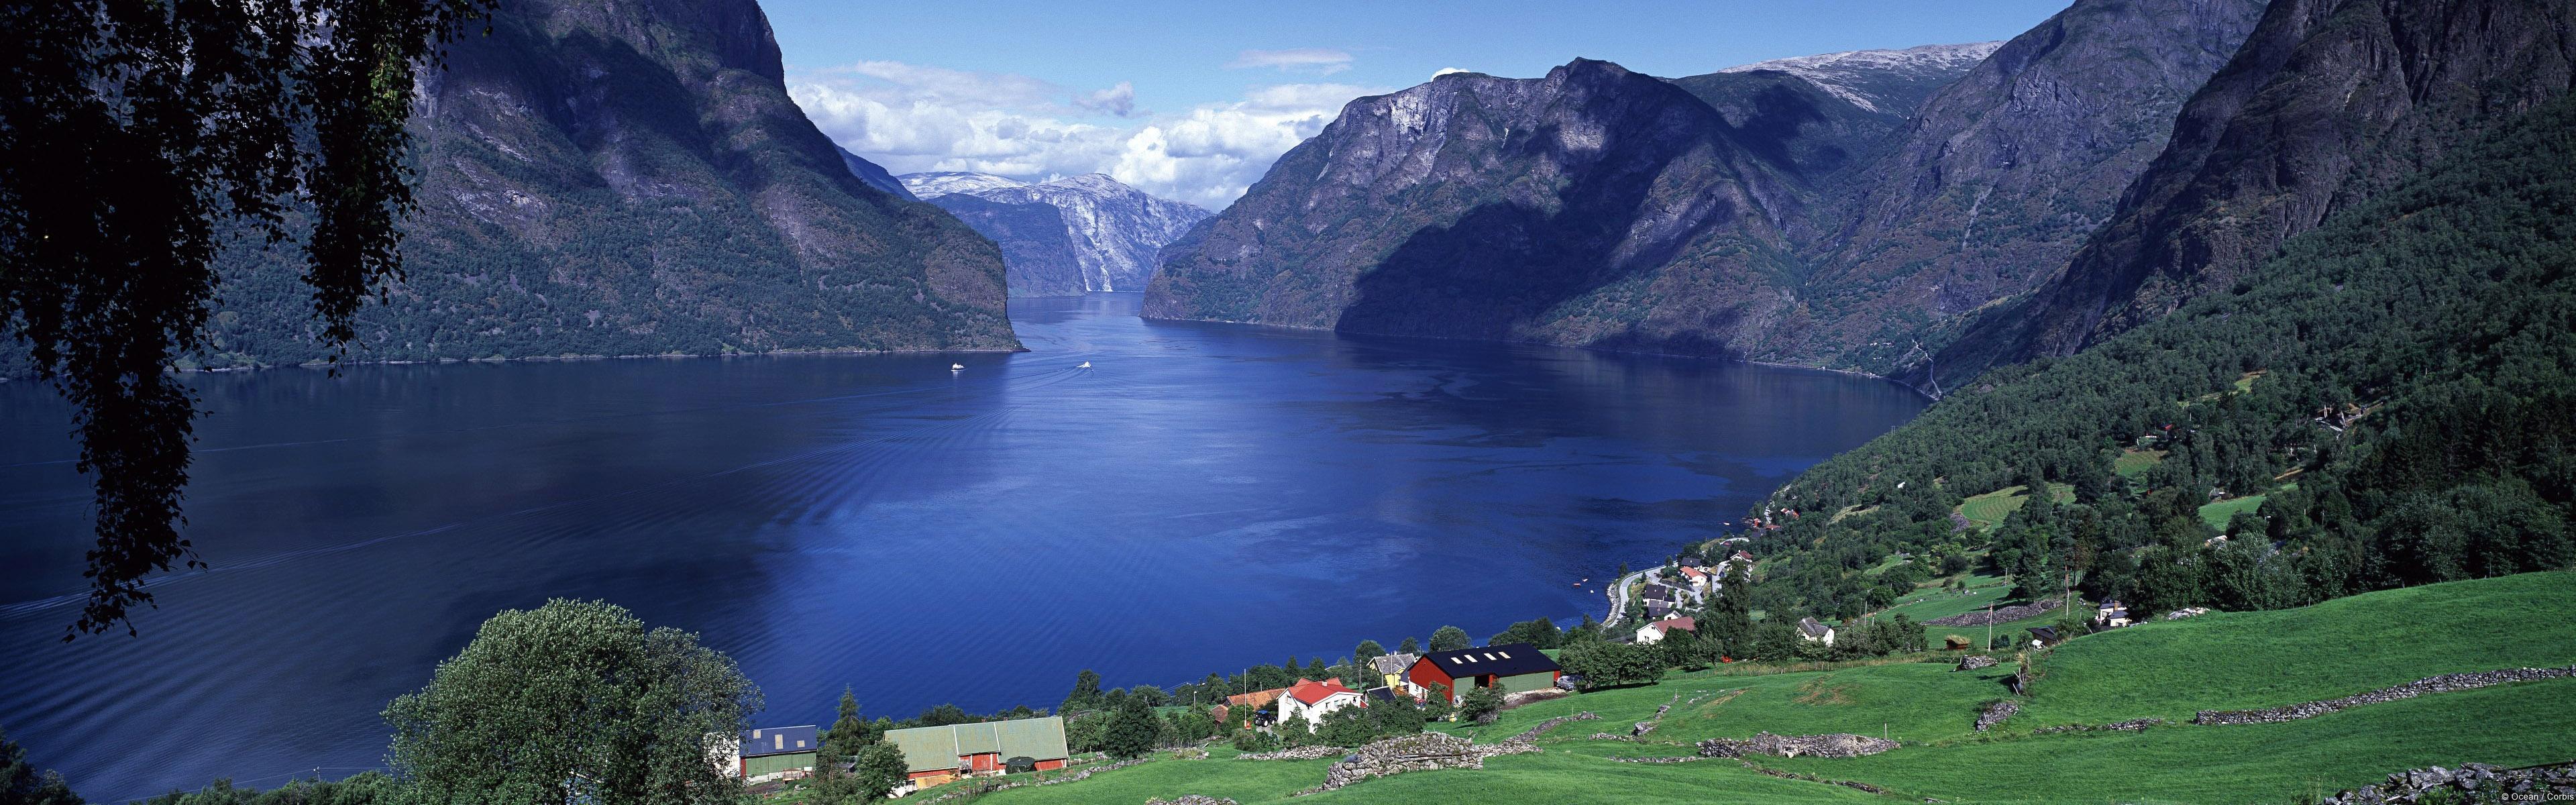 Aurlandsfjord Norway Wallpapers HD Wallpapers 3840x1200